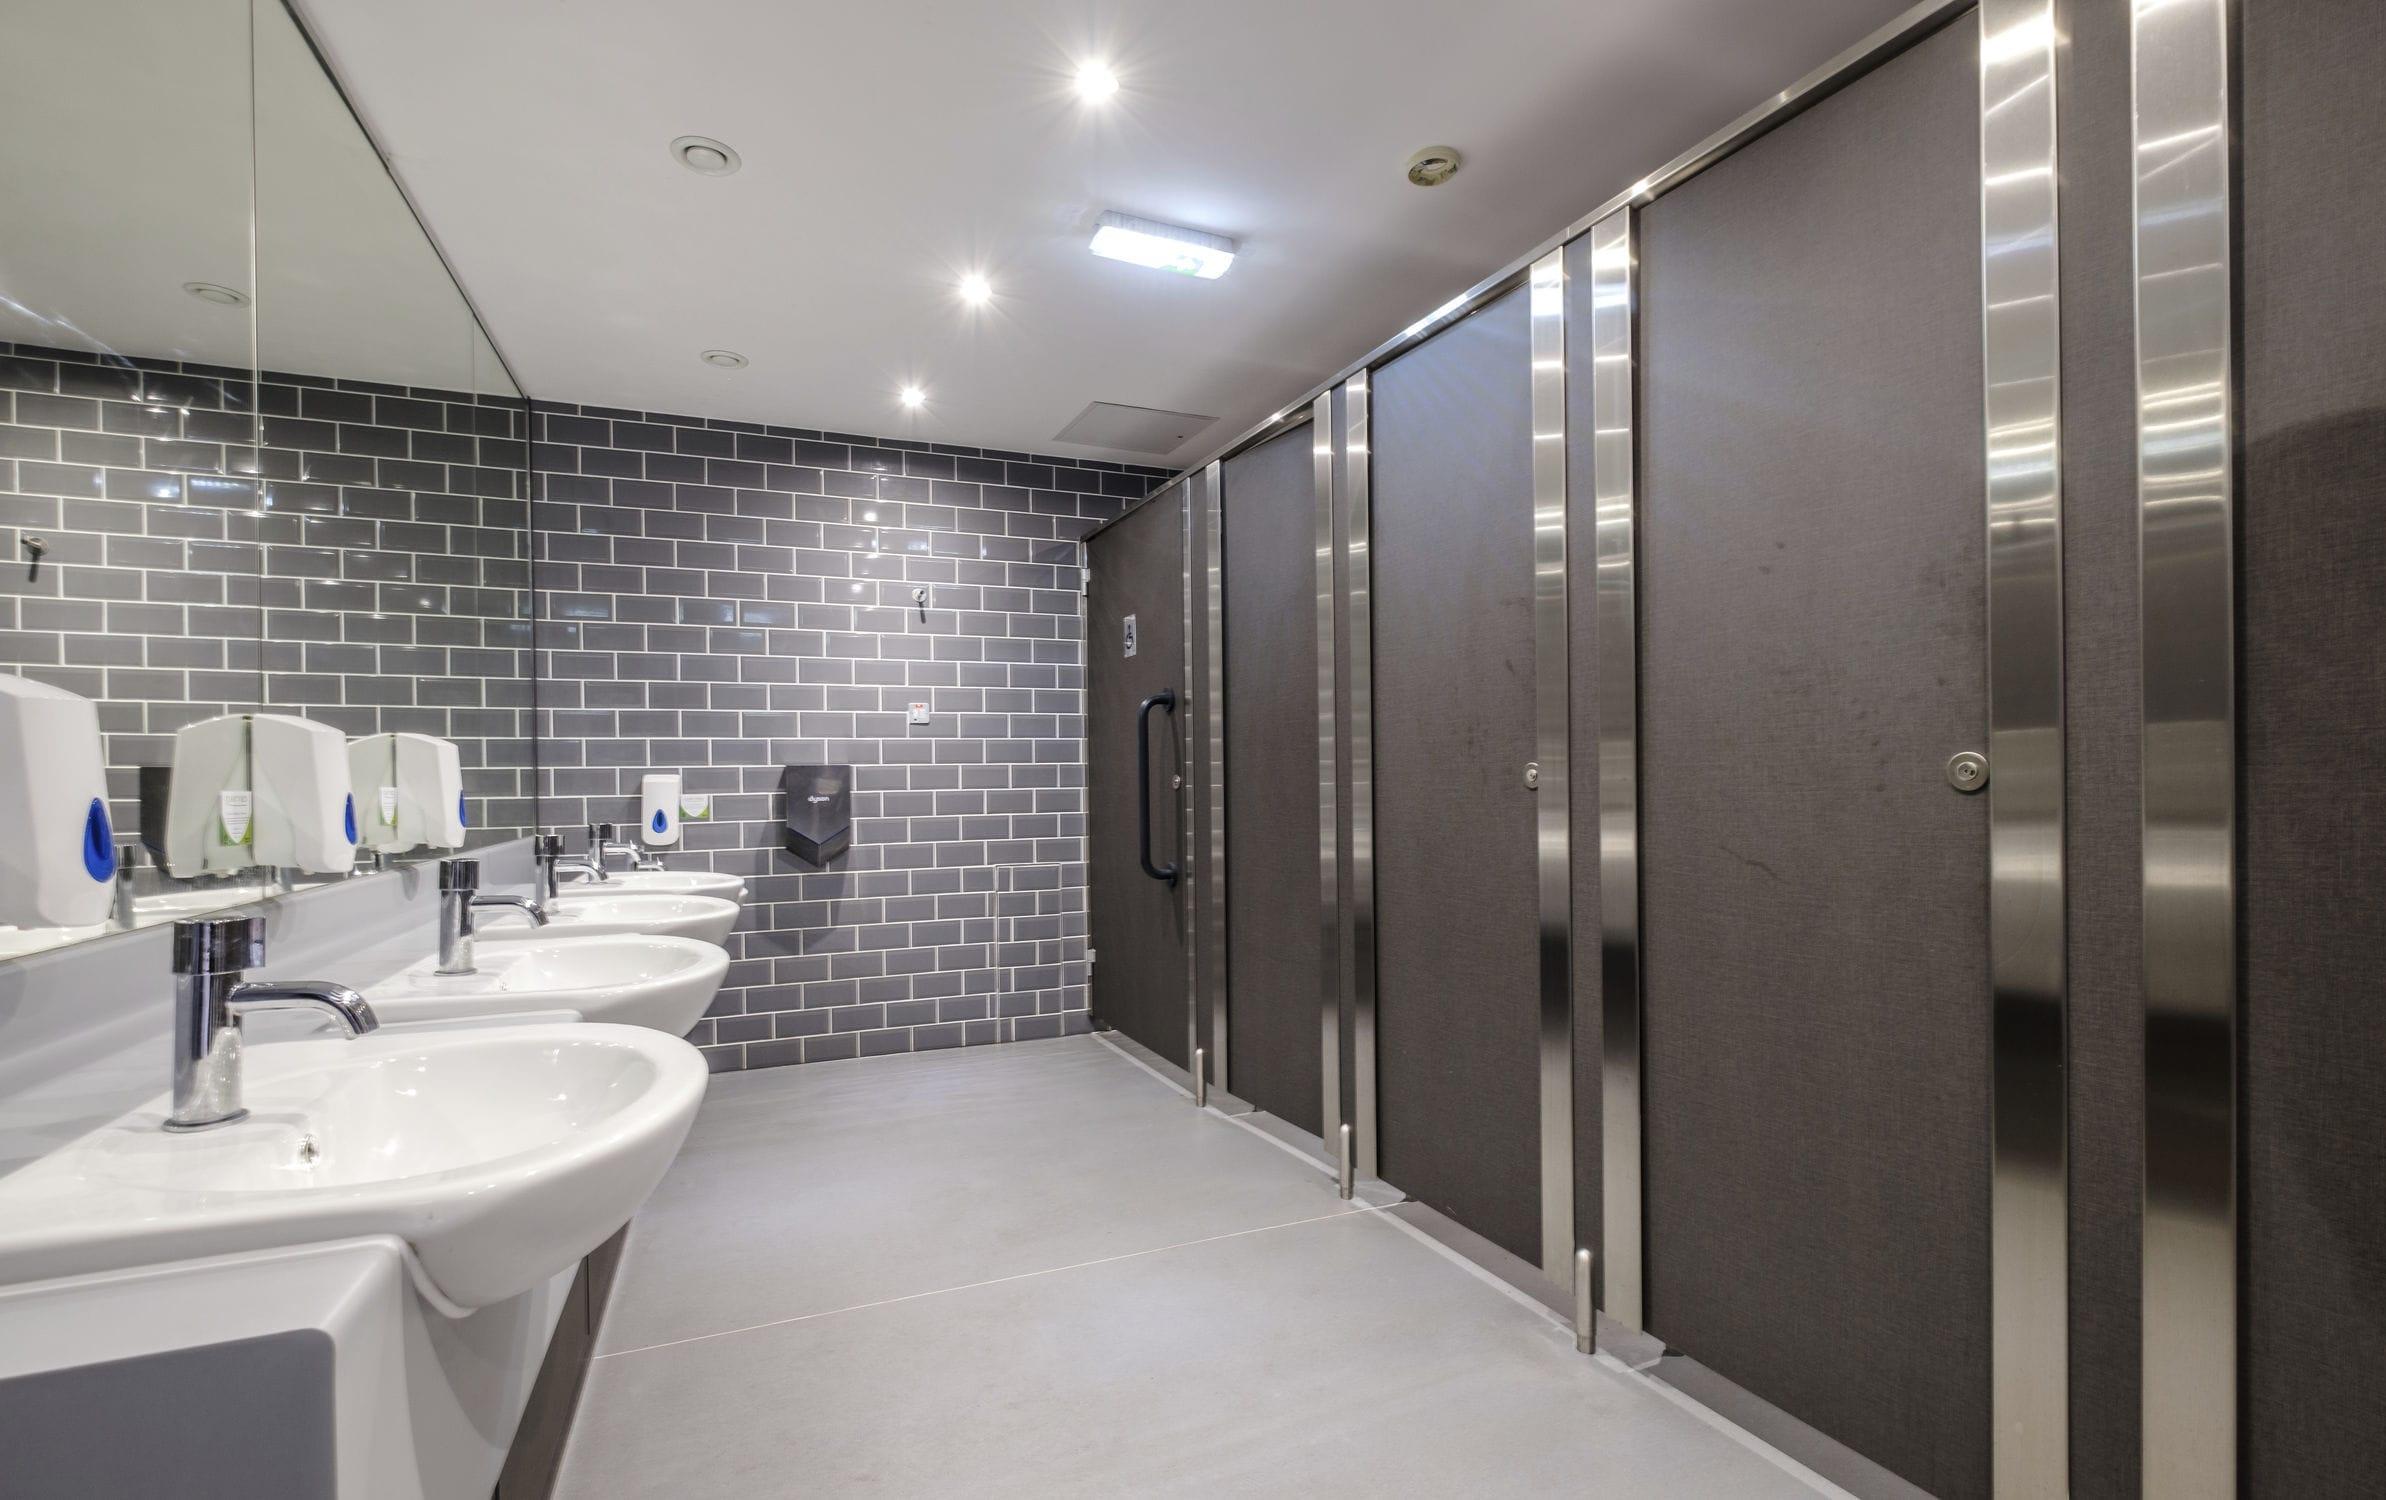 Public washroom toilet cubicle / stainless steel - SENZA - Washroom ...